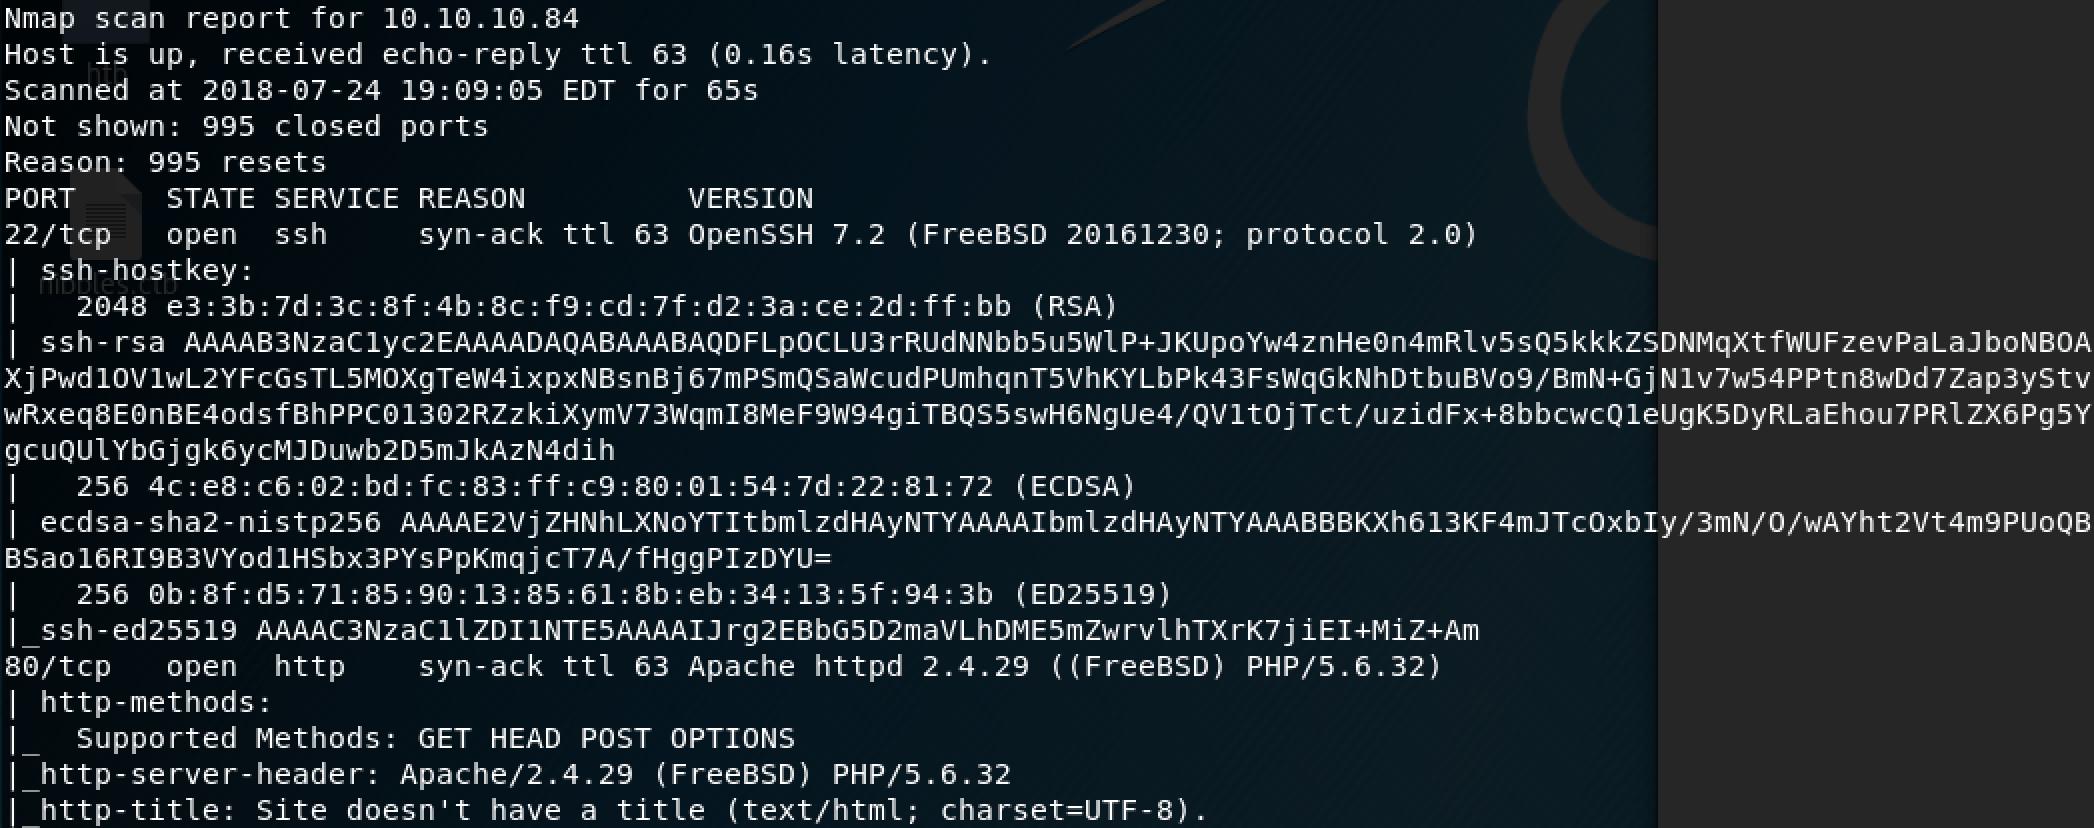 HackTheBox Poison nmap scan